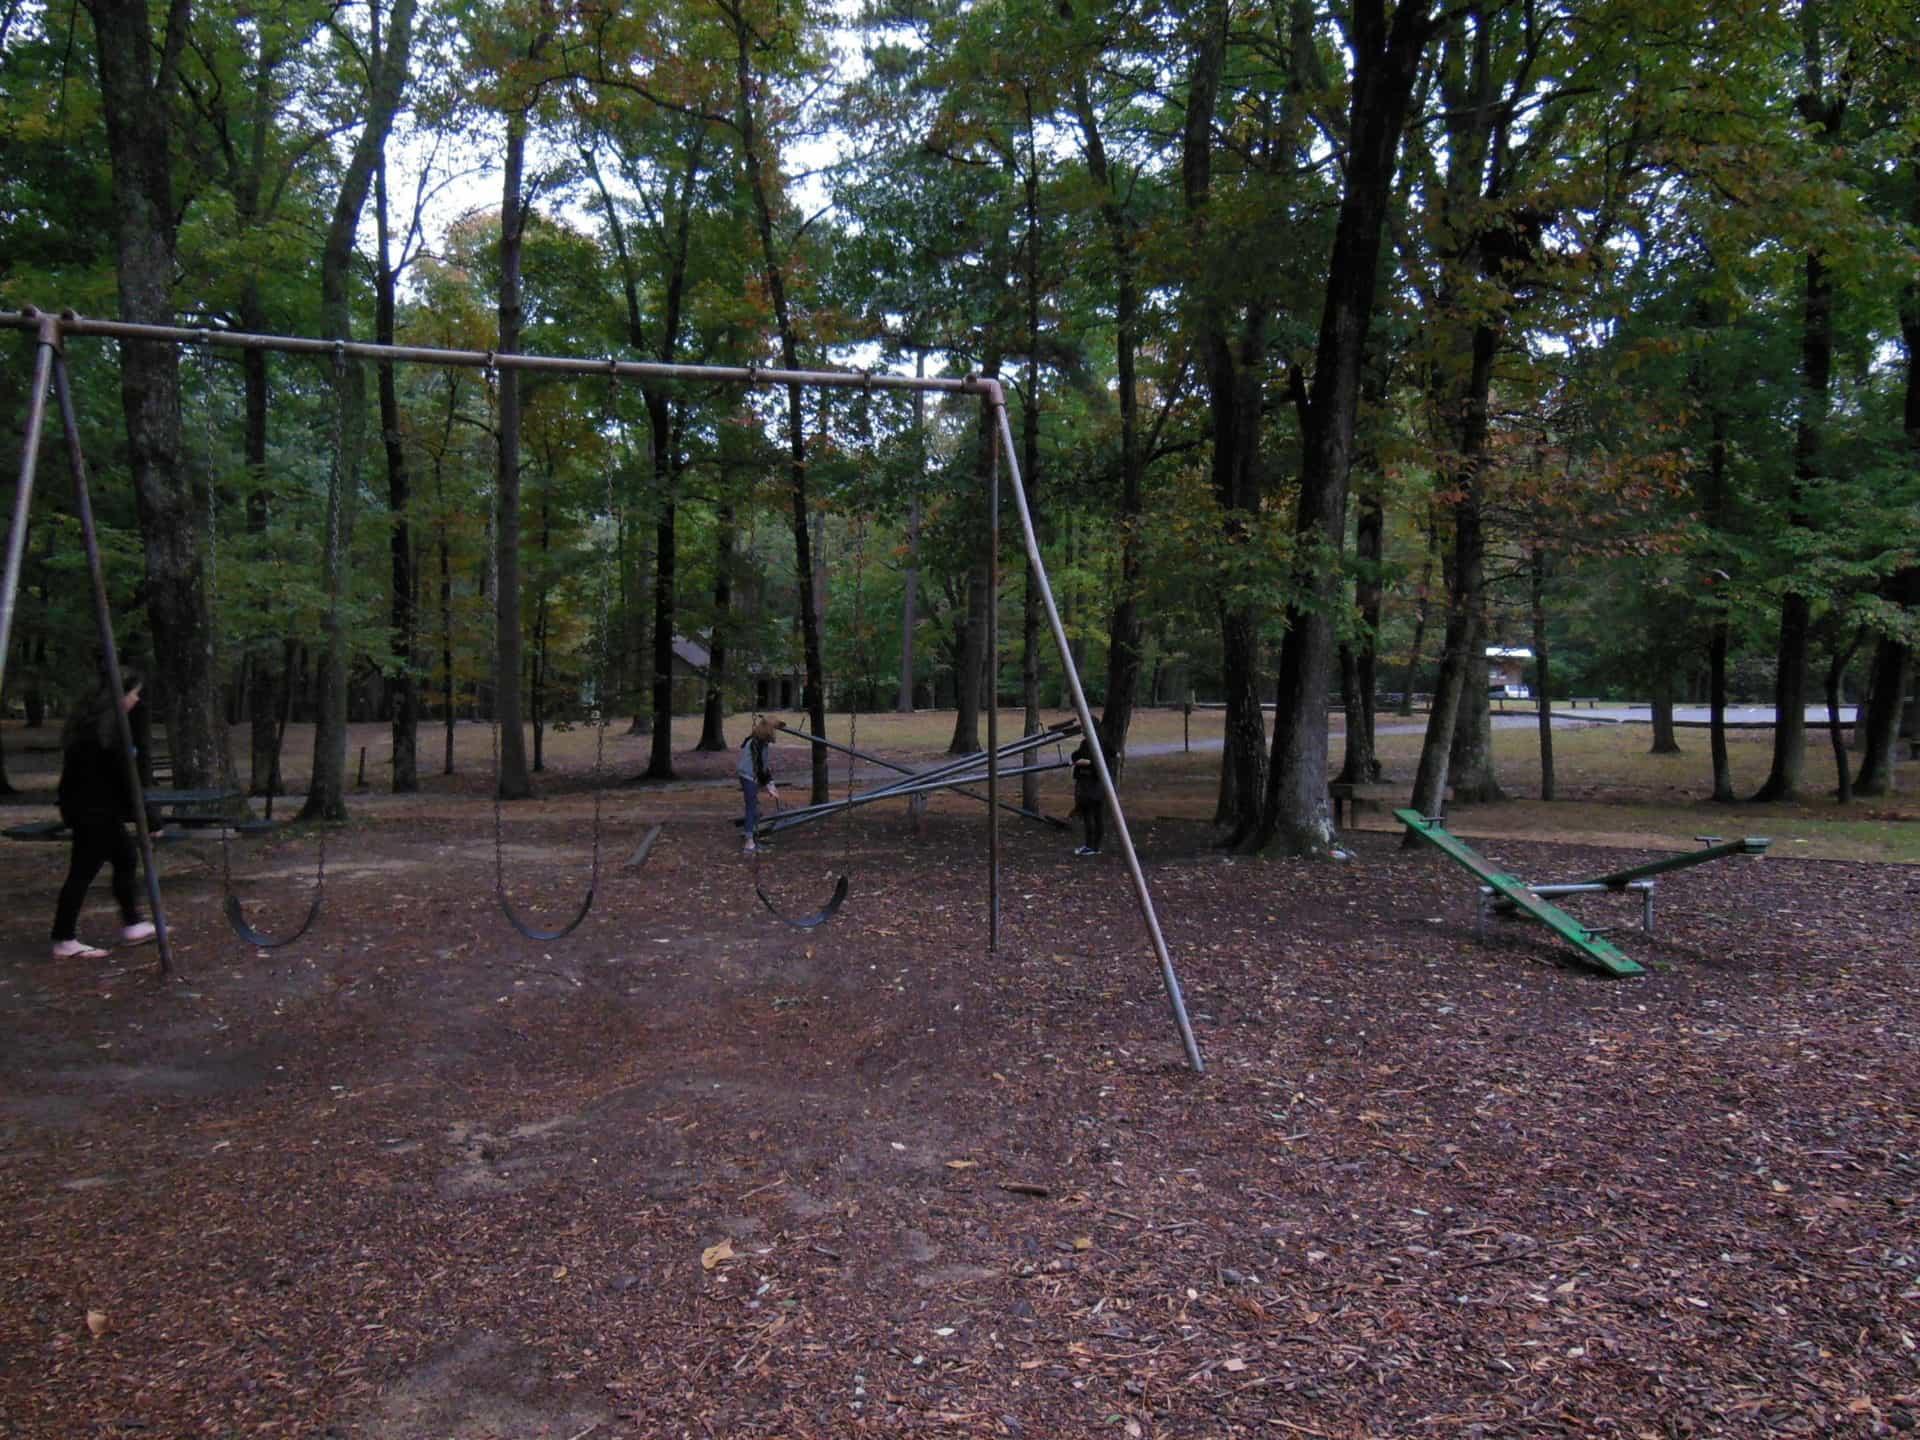 Monte Sano State Park - Swings